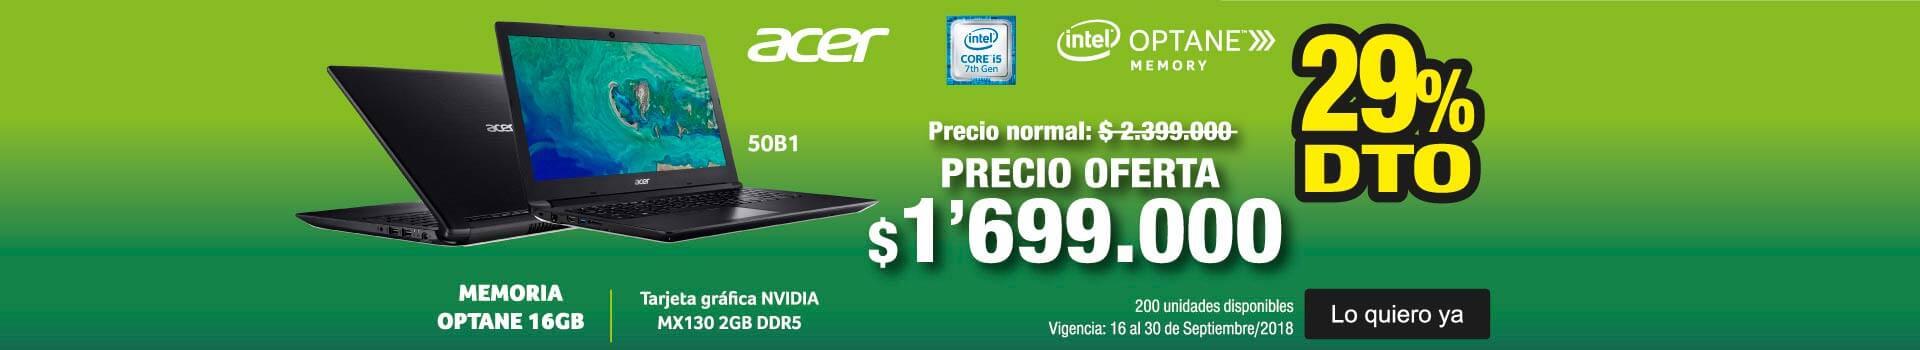 AK-KT-BCAT-5-computadores y tablets-PP-EXP-Acer-Portátil 50B1-Sep22